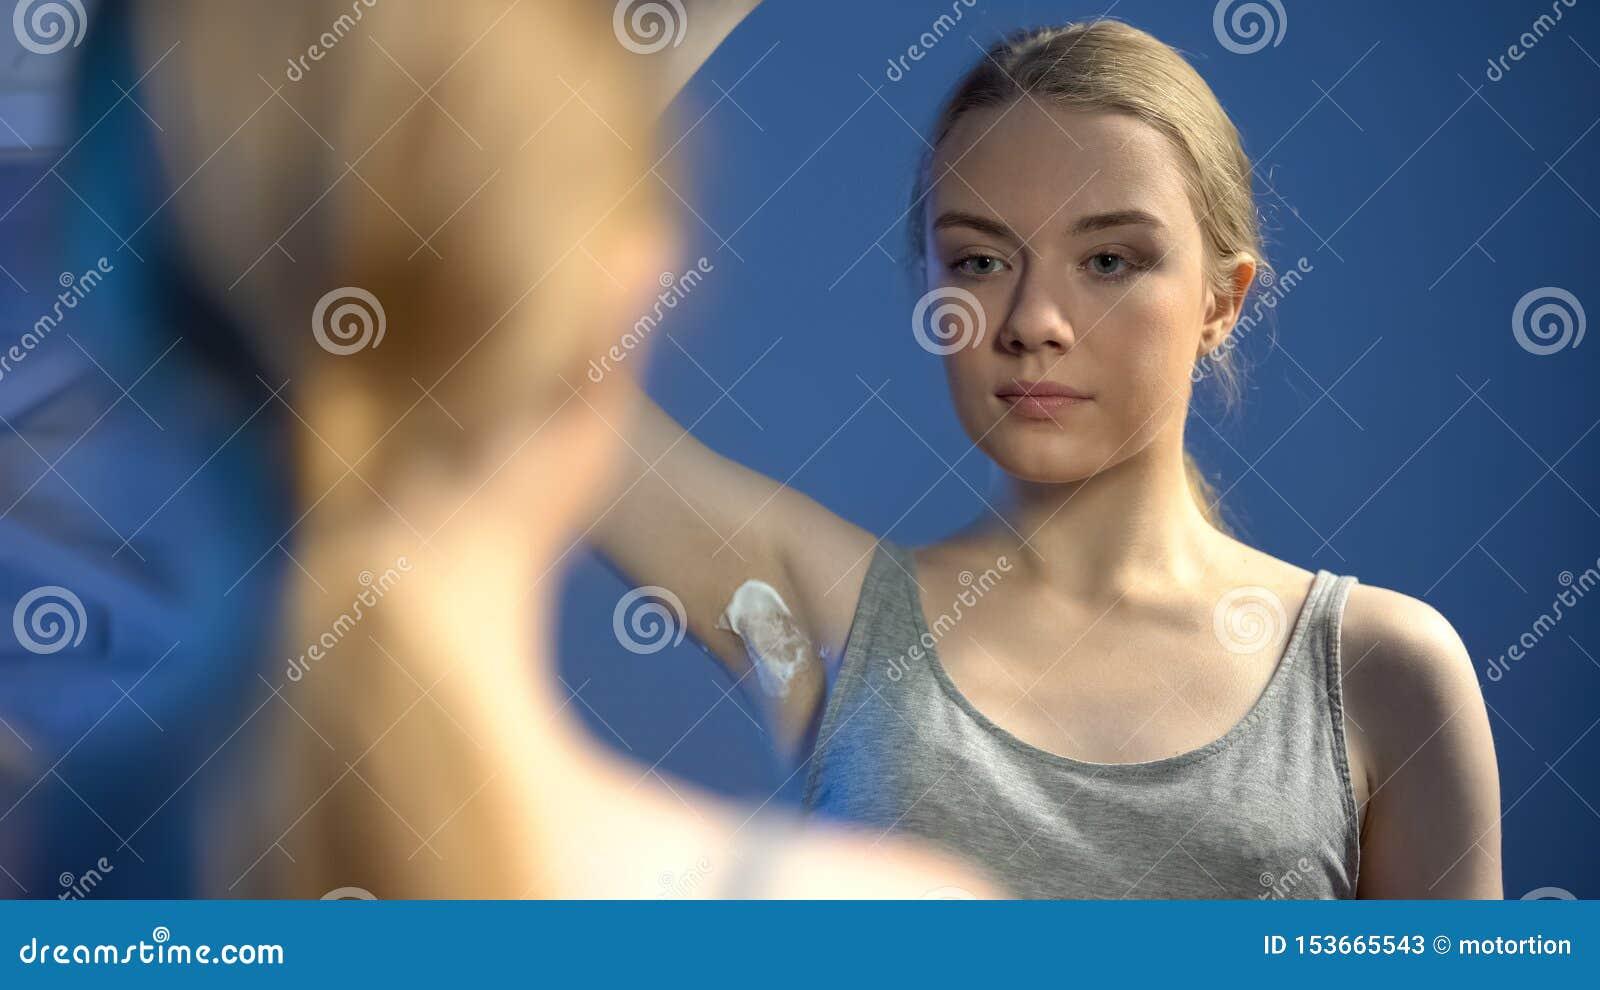 Teen Armpit Pics